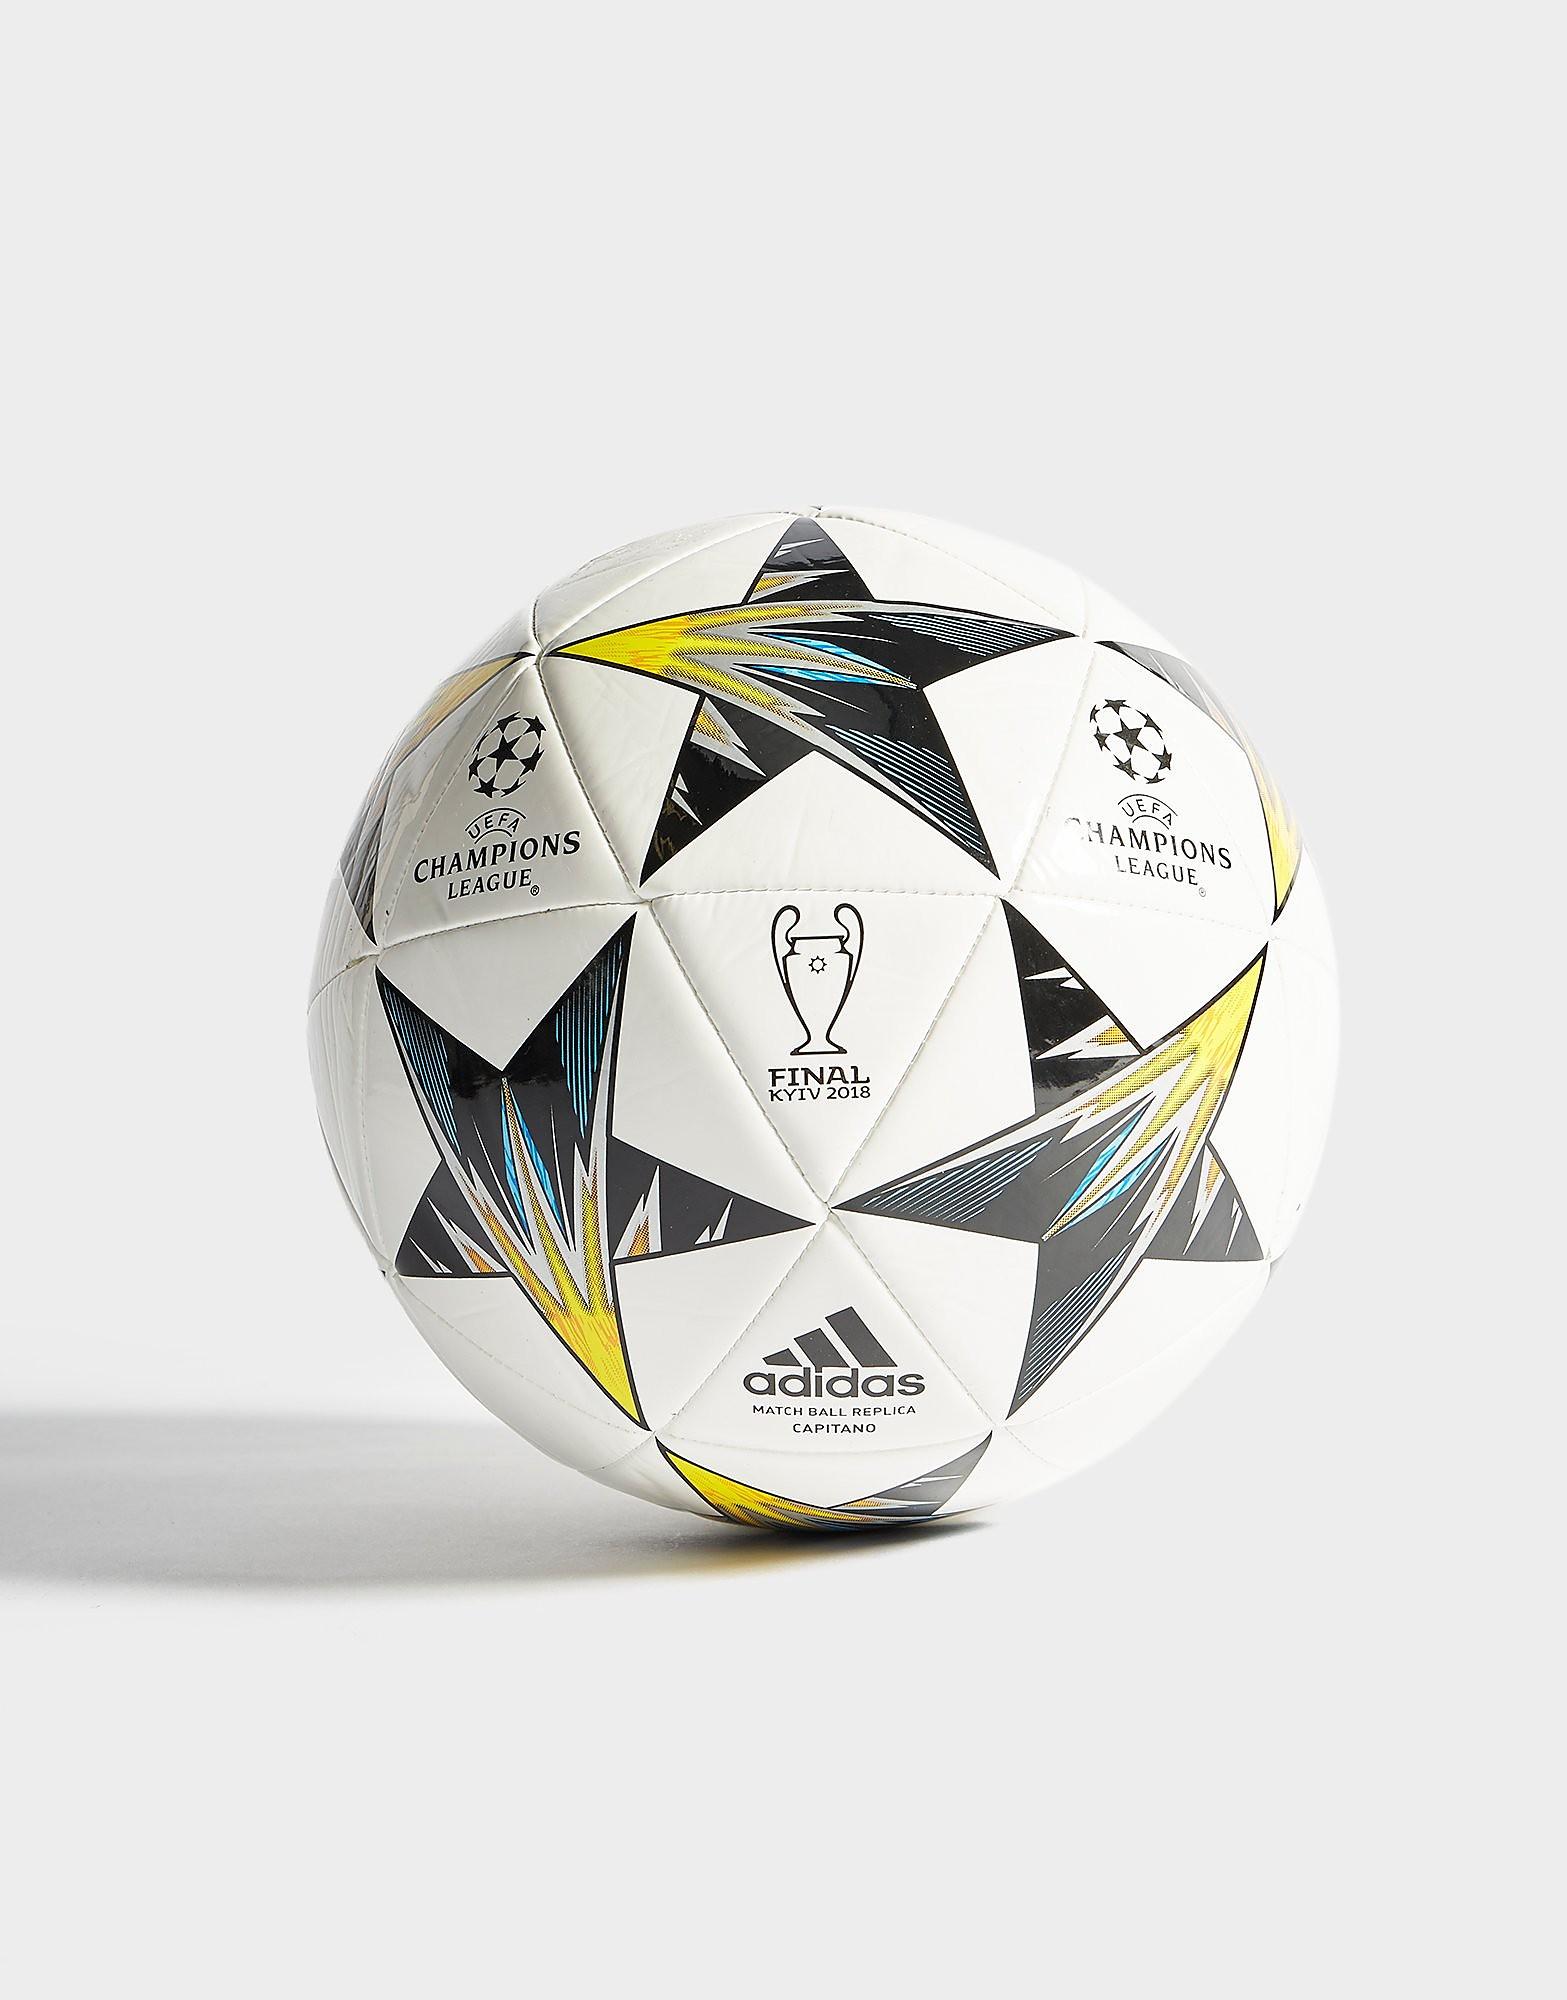 adidas Champions League 2018 Final Football